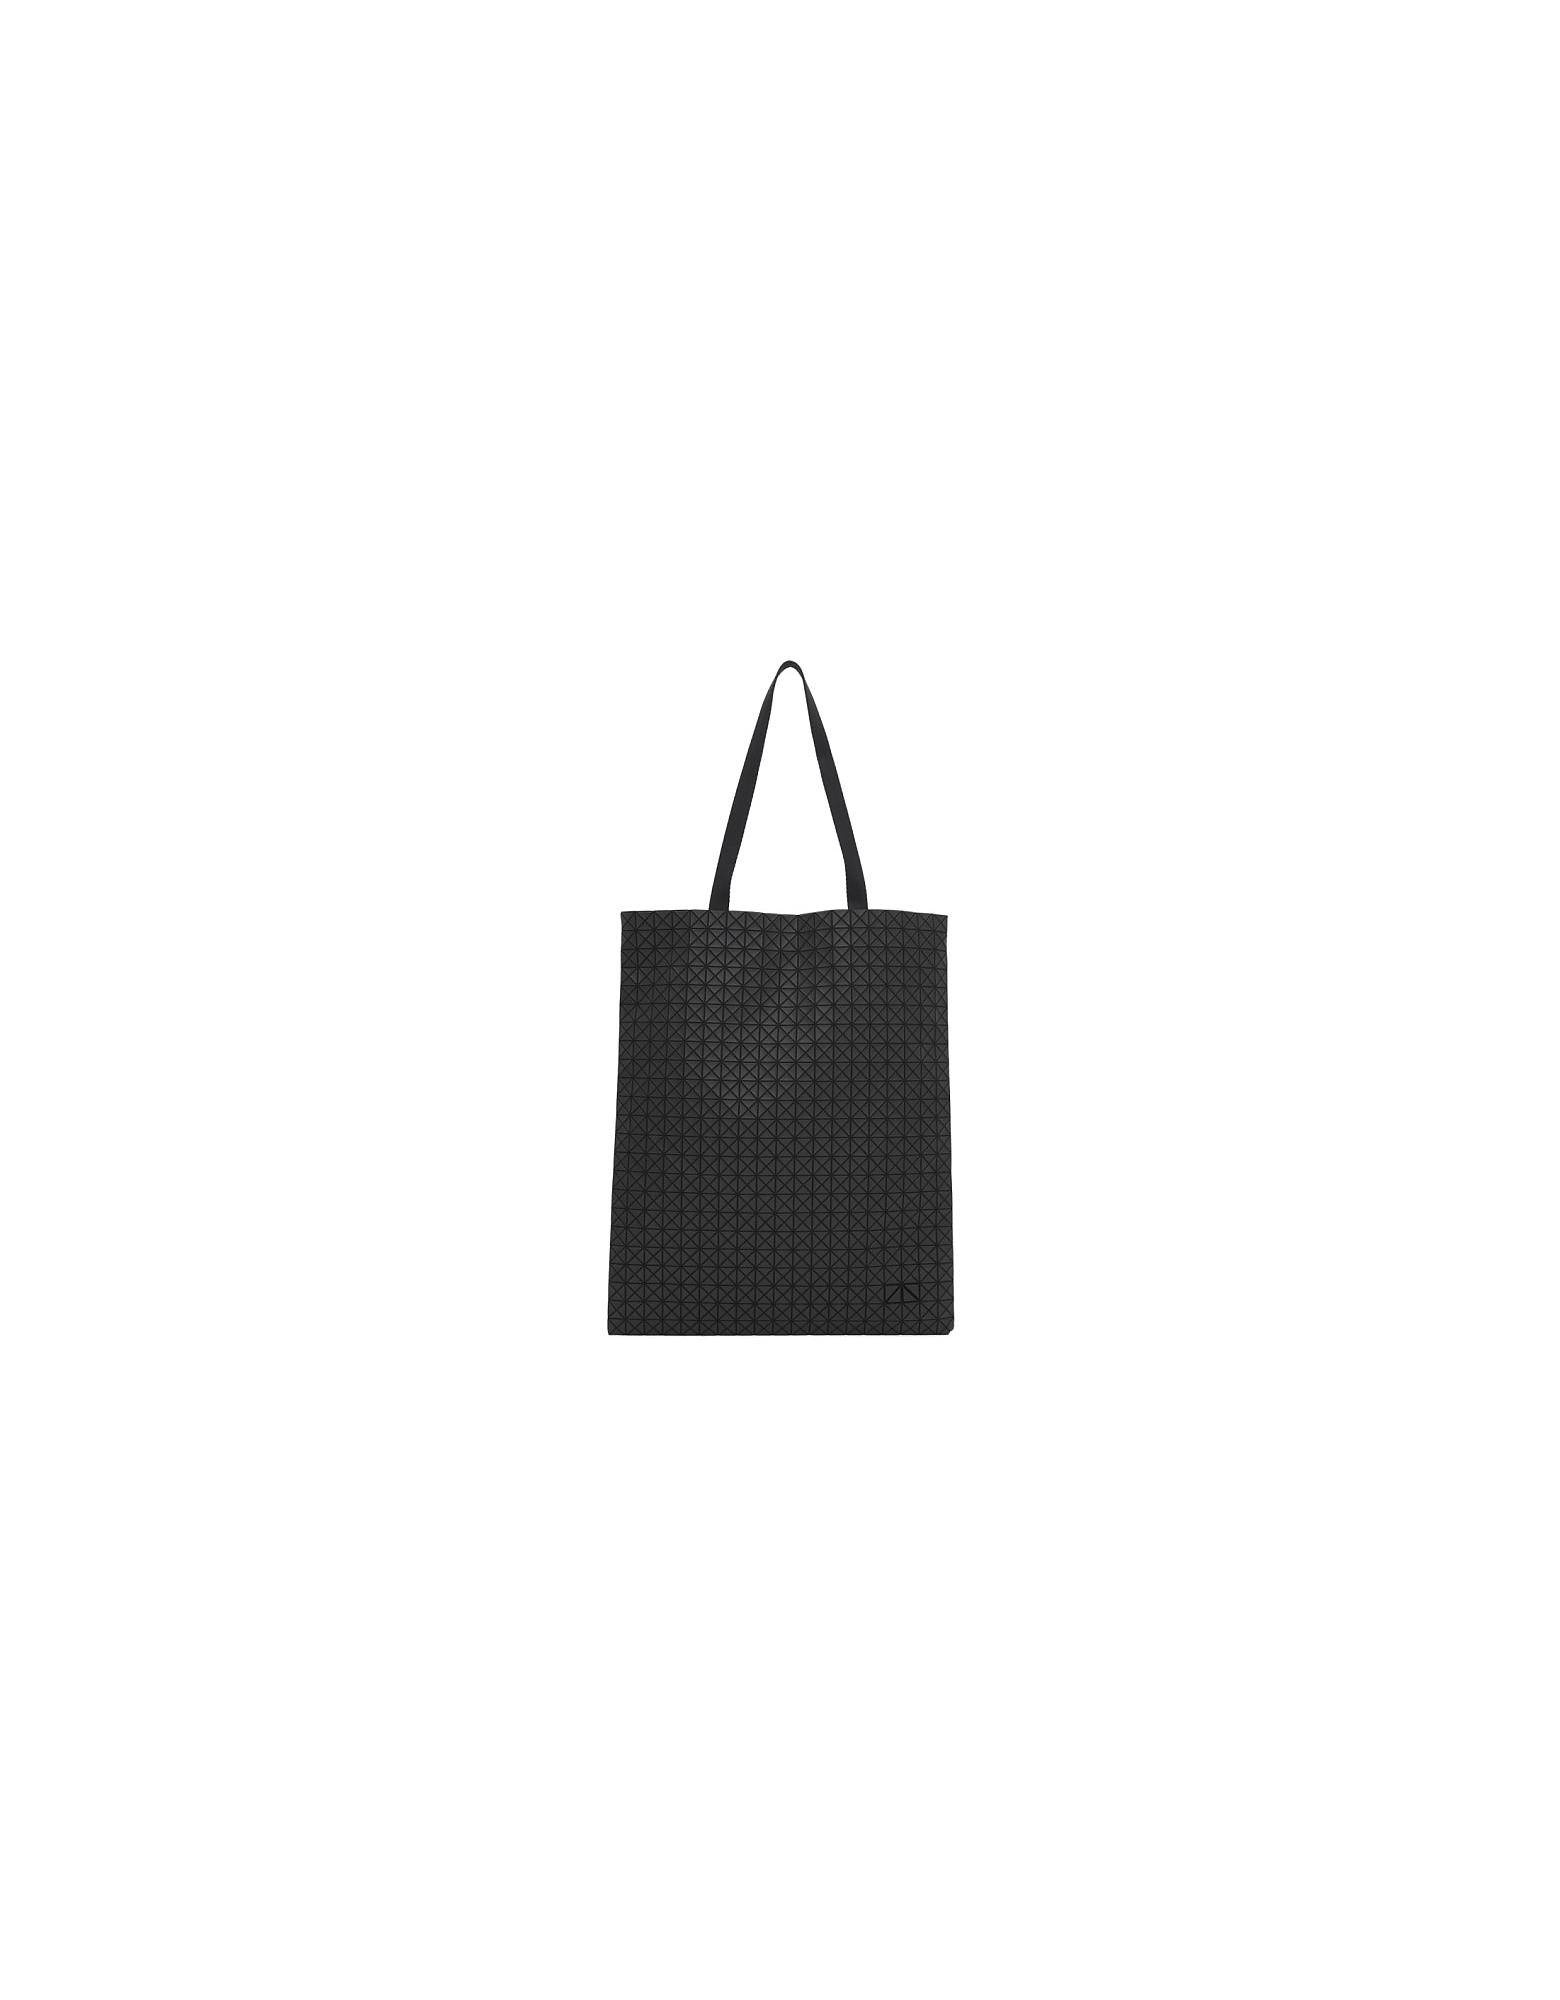 Issey Miyake Designer Handbags, Black Crispy Carry Tote